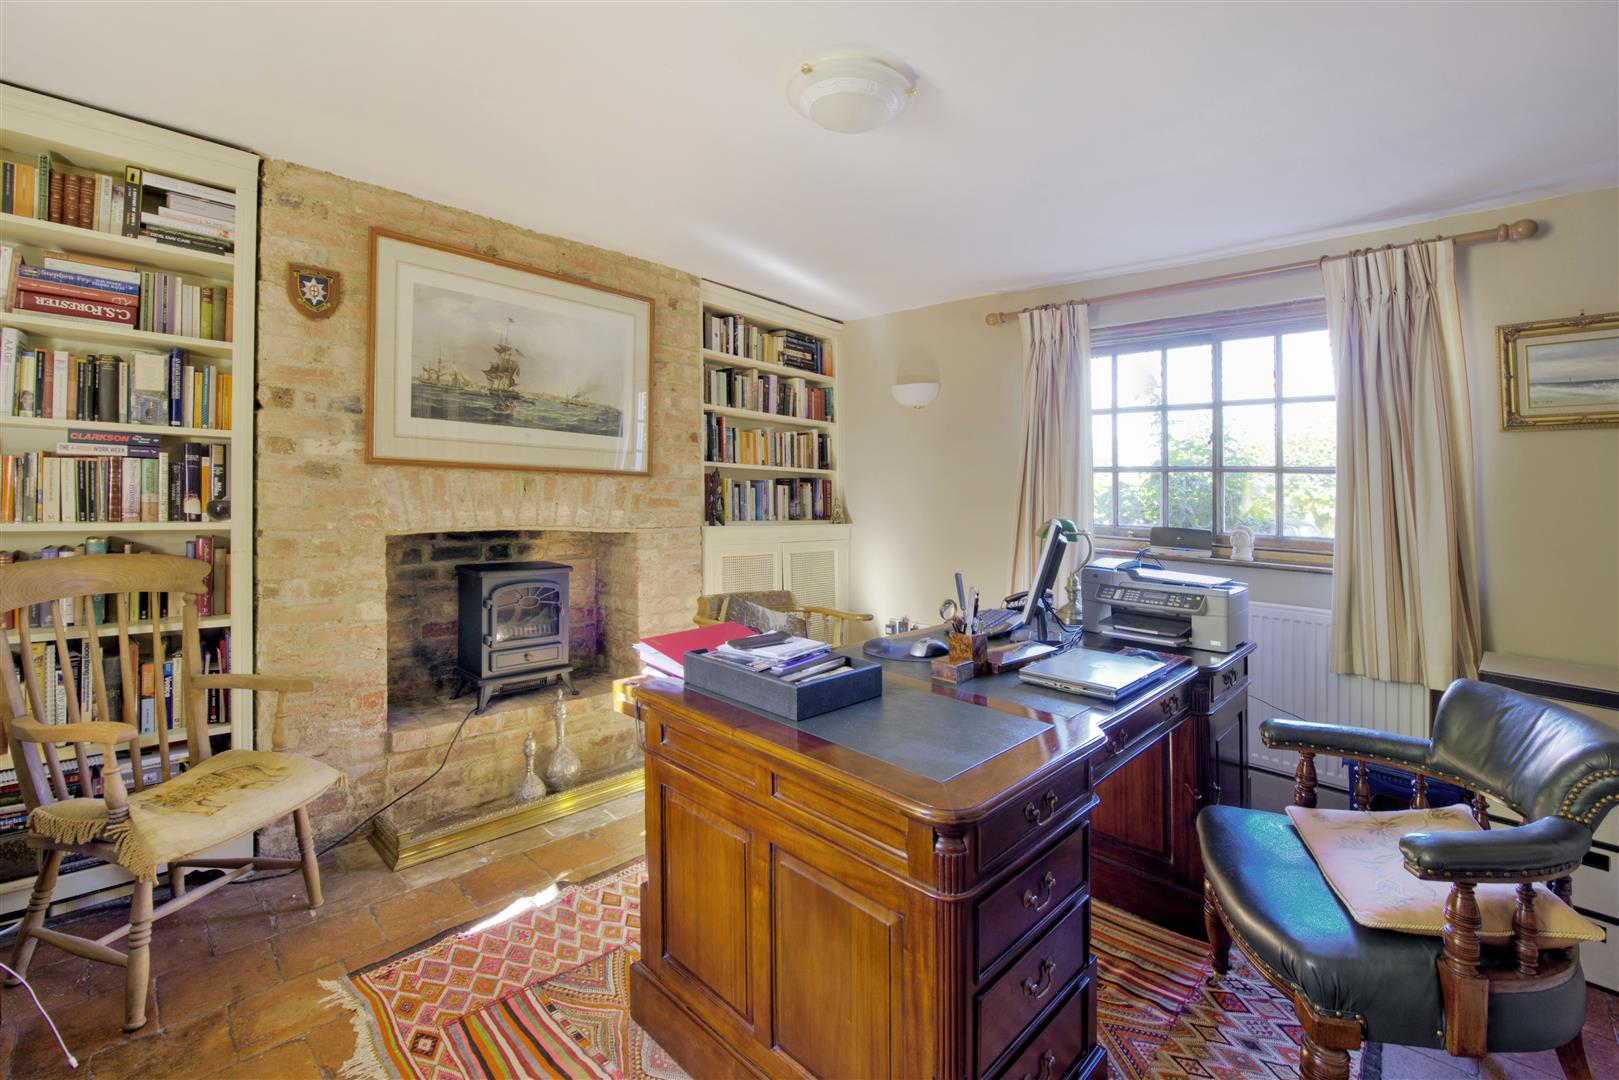 5 bedroom detached for sale in st neots